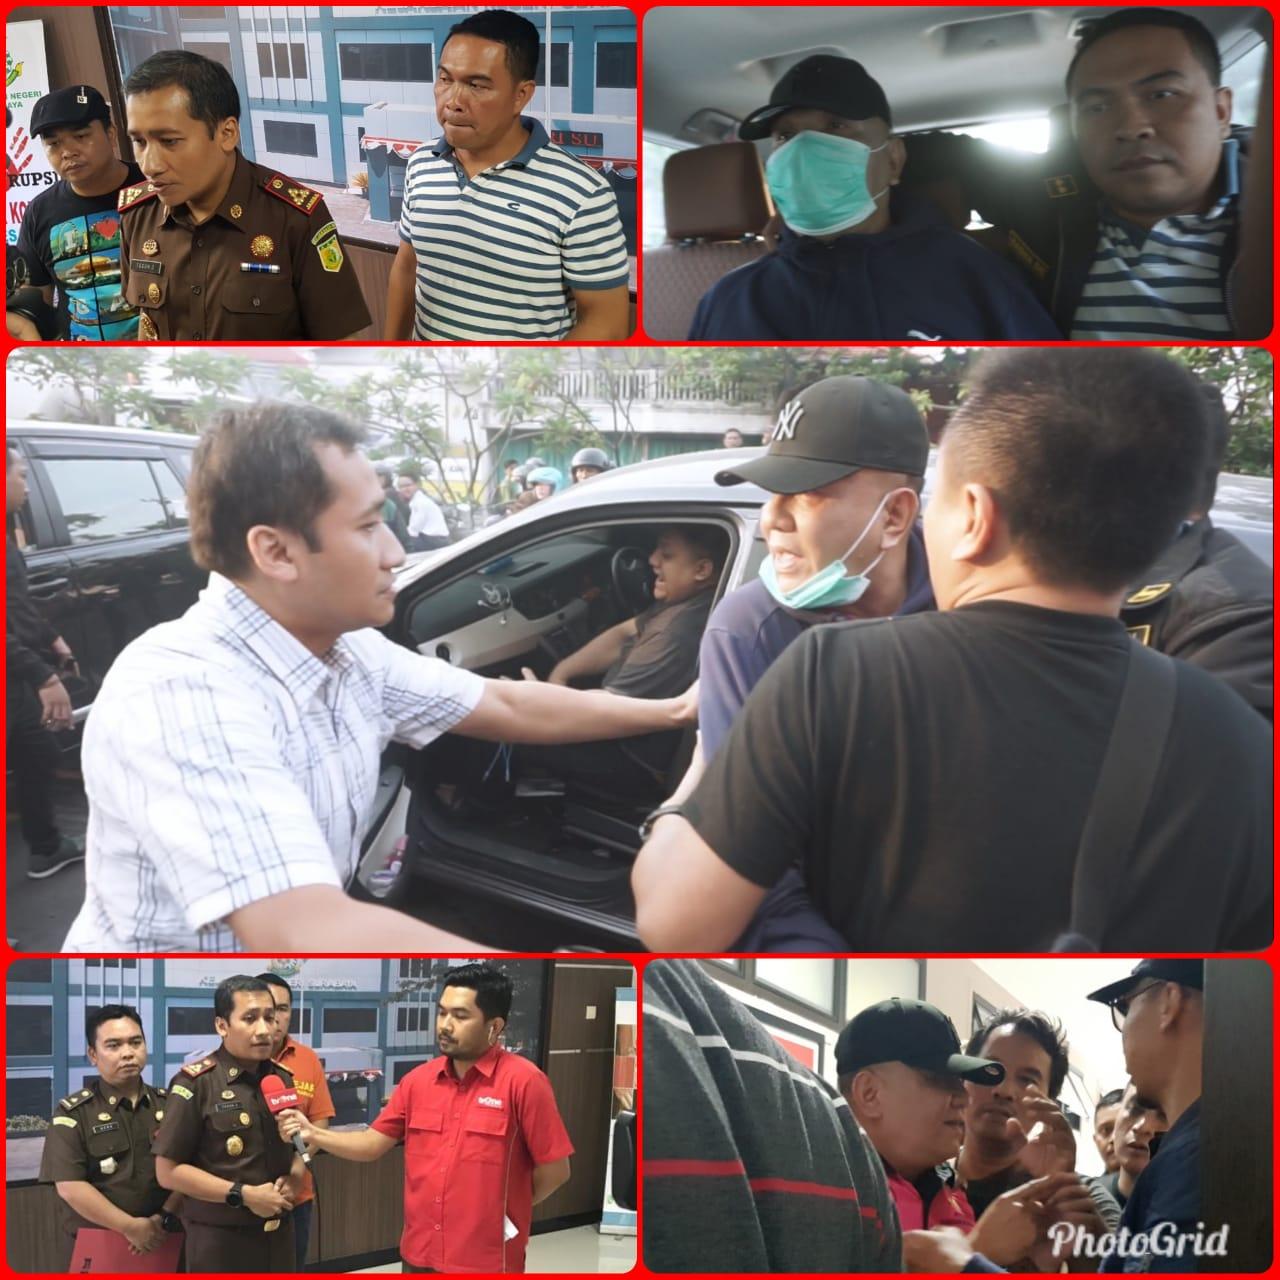 Penangkapan DPO Wisnu Wardhana 09-01-2019